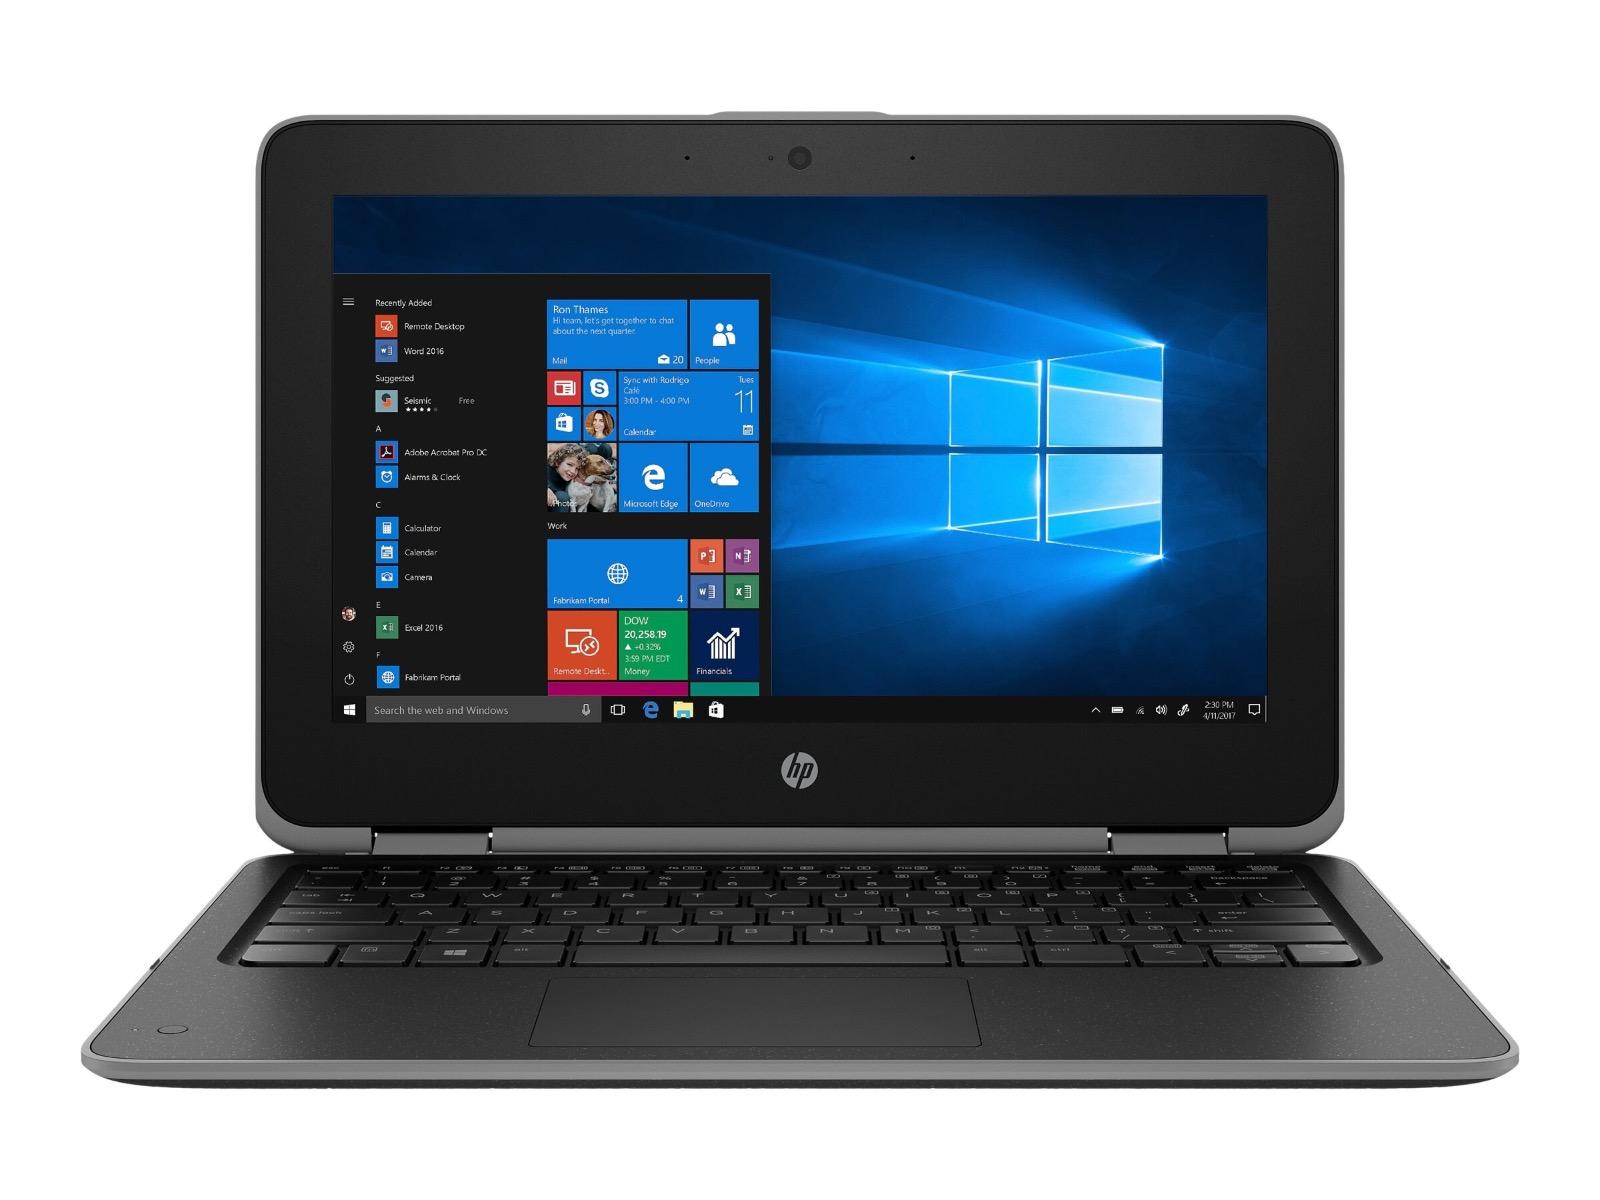 HP ProBook X360 11 G4 Laptop Cover